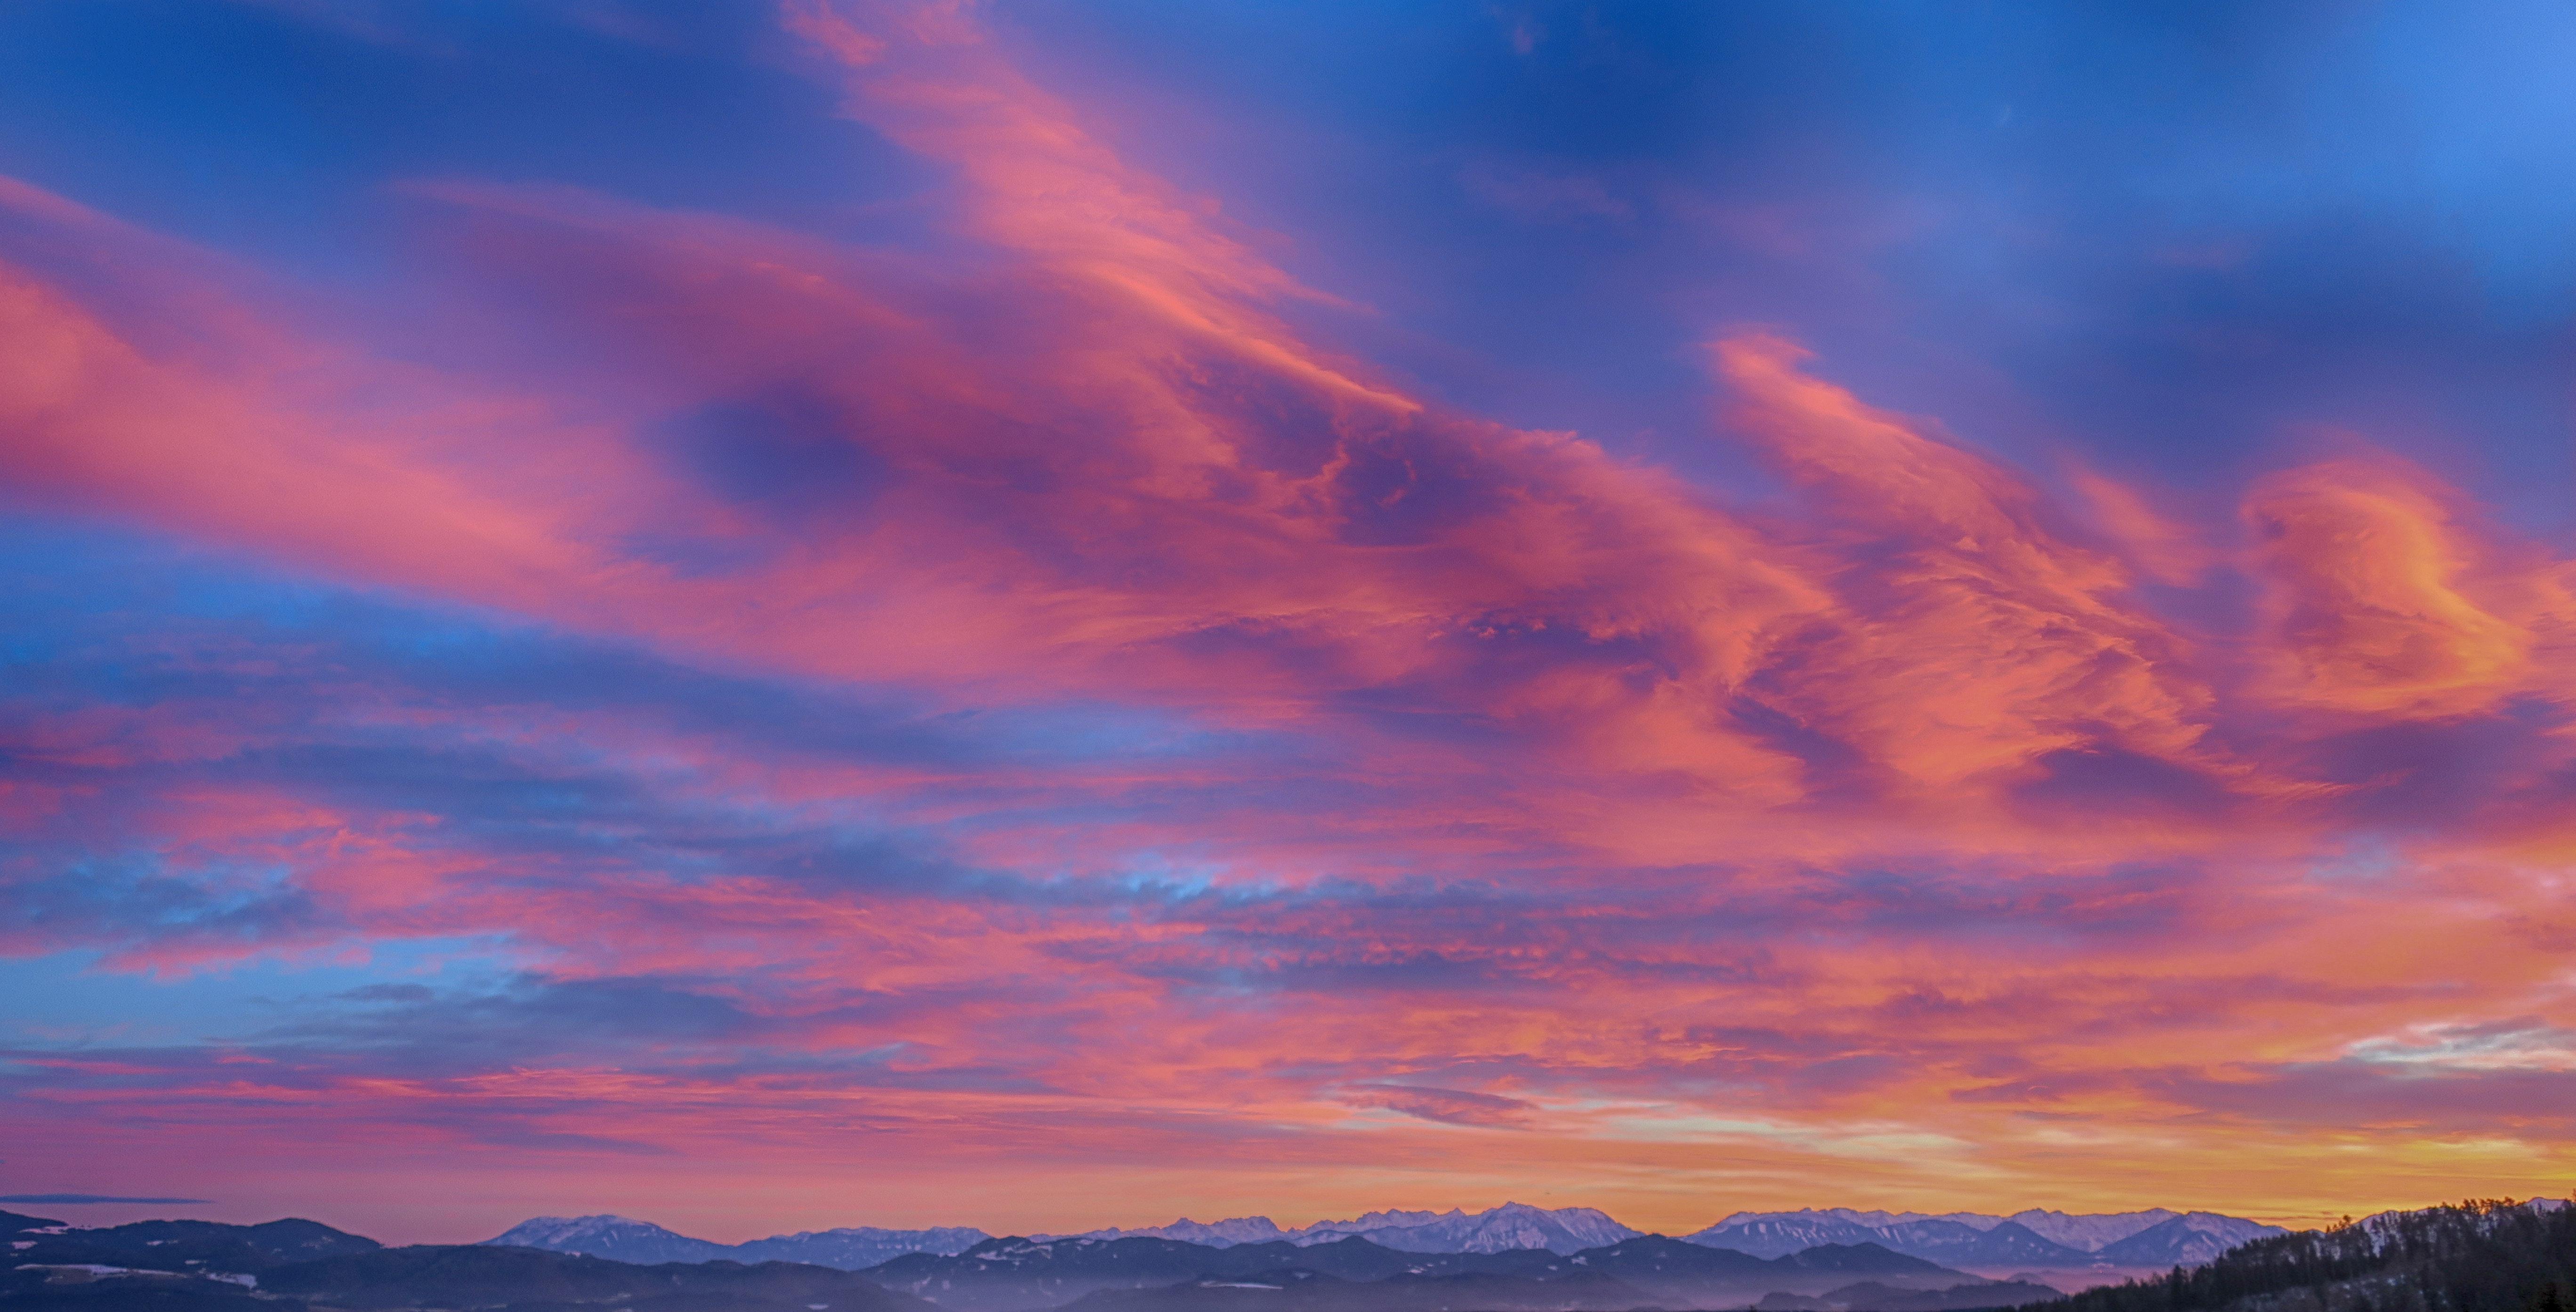 Twilight landscape beautiful sunset coast desktop wallpaper Gallery 5472x2788